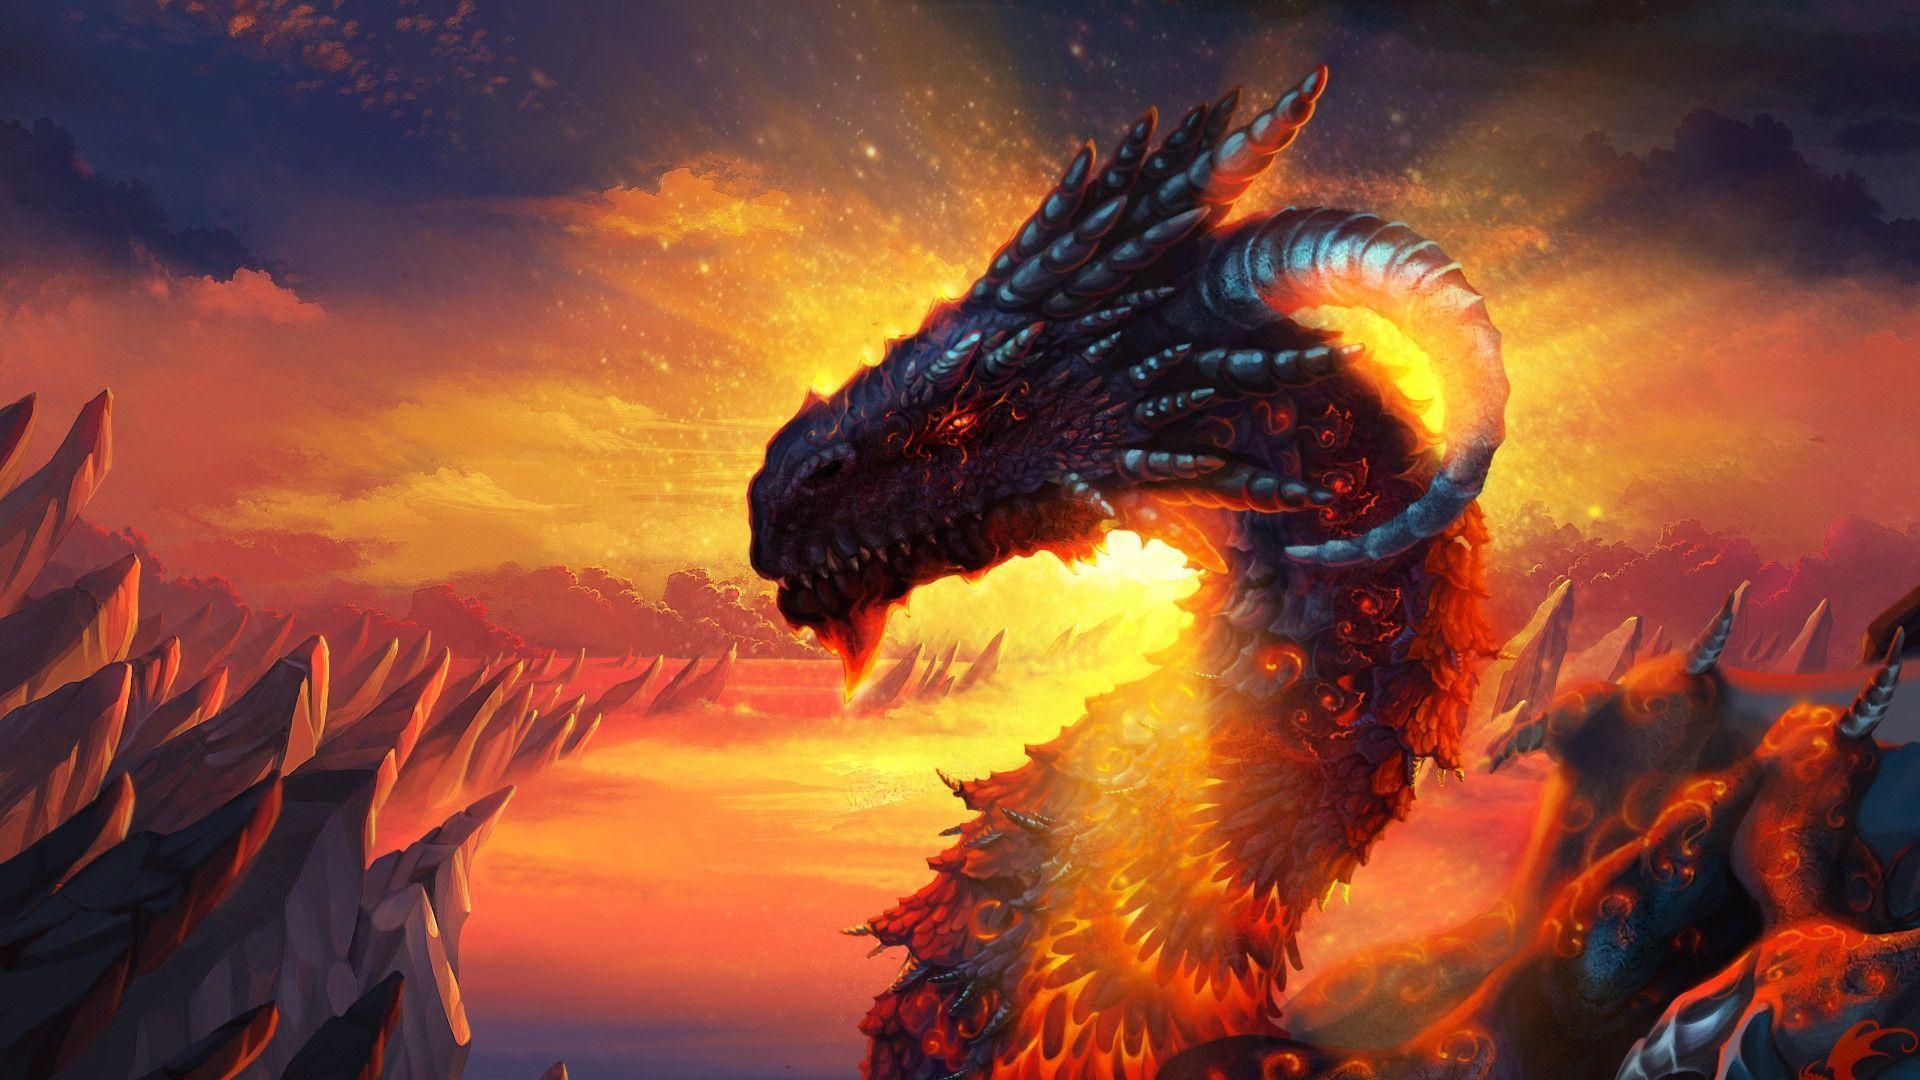 Fantasy Dragon Wallpapers Wallpaper Cave